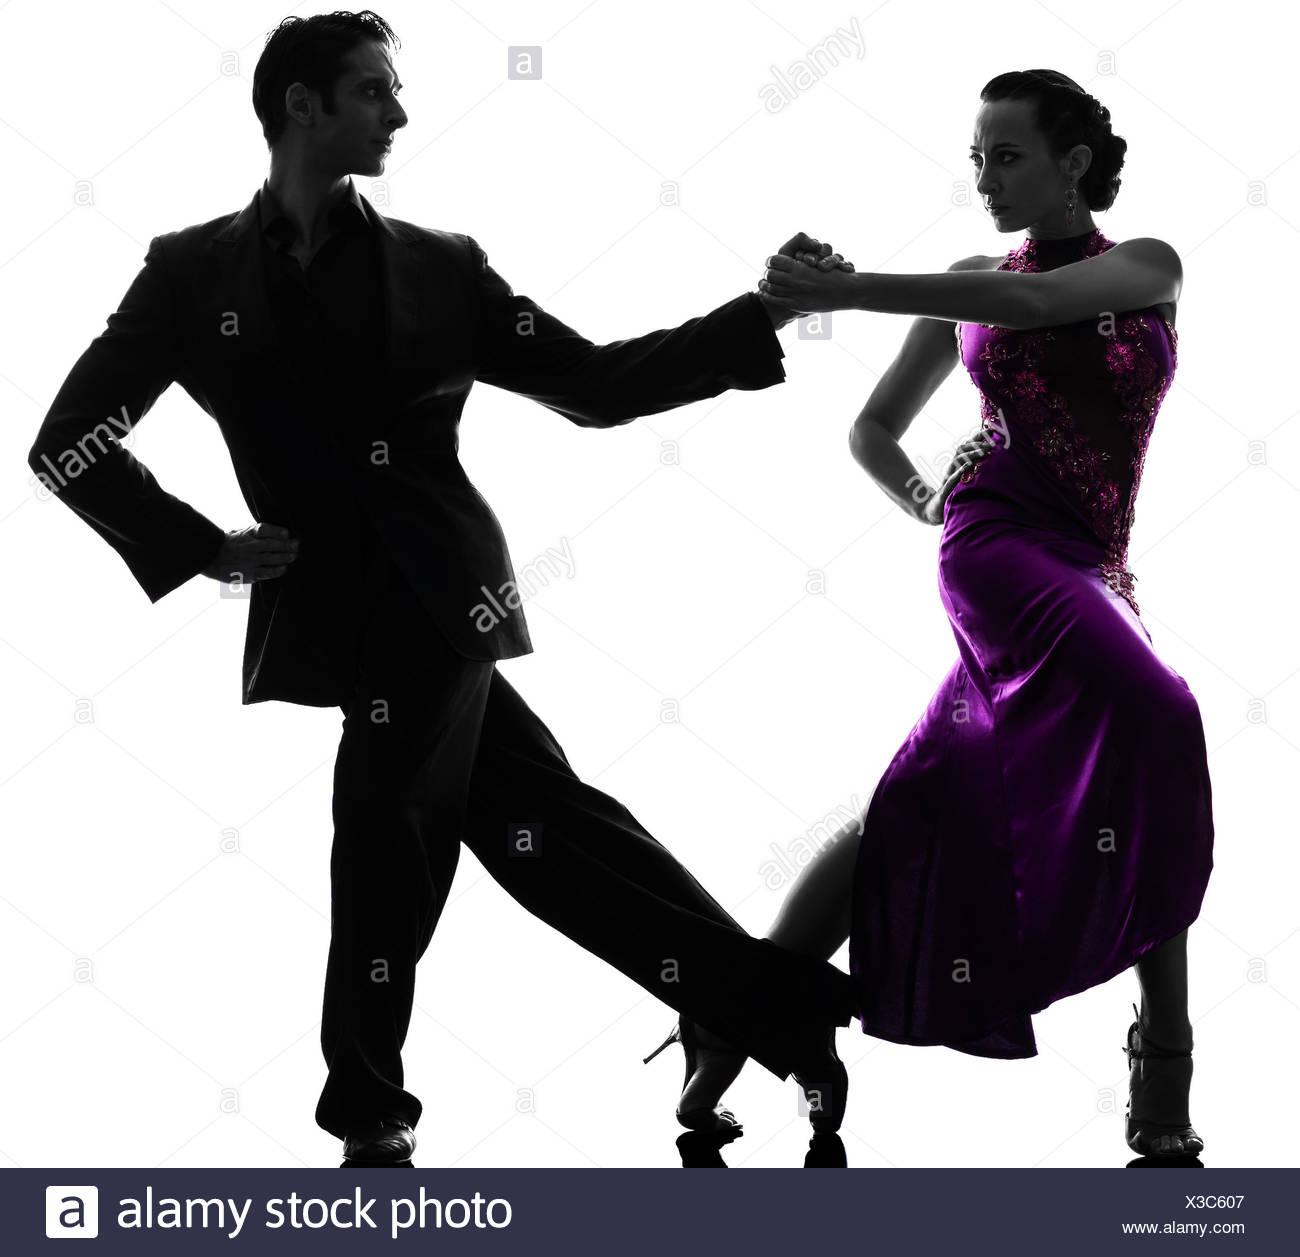 1300x1257 Dancing Salsa Silhouette Stock Photos Amp Dancing Salsa Silhouette